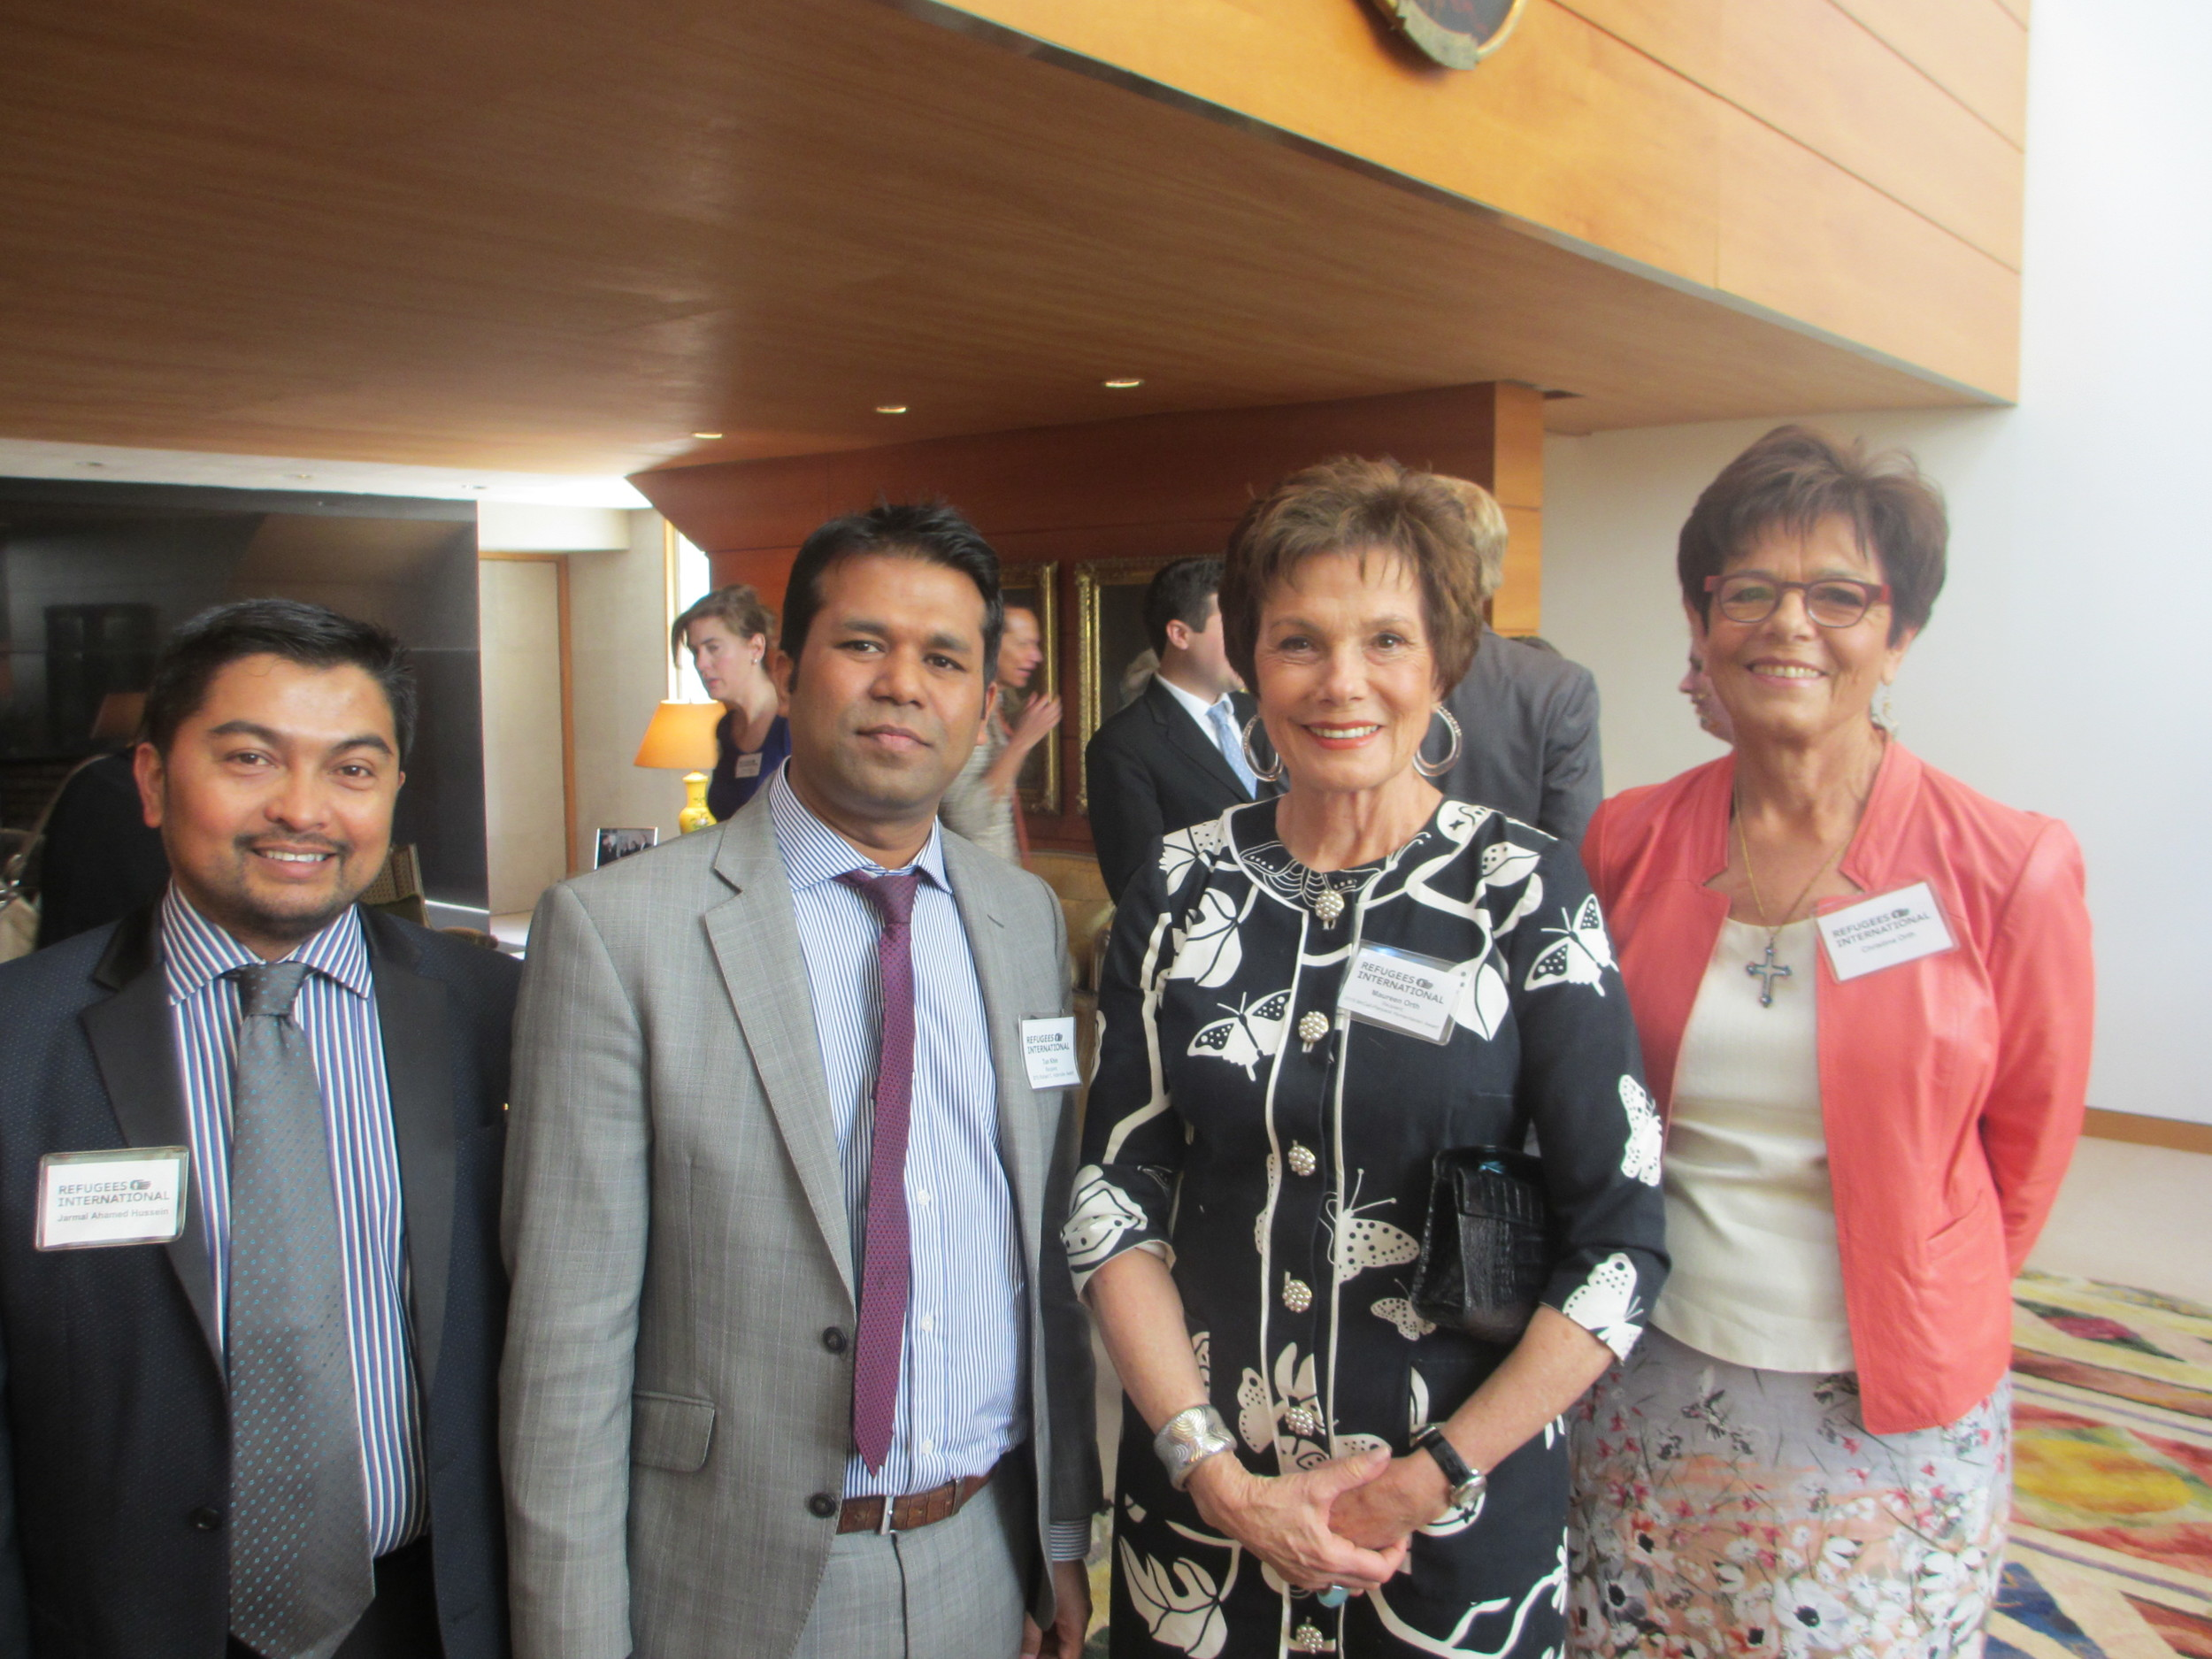 Jamal Ahamed Hussein, Richard C. Holbrooke Award Recipient Tun Khin, McCall-Pierpaoli Award Recipient Maureen Orth, and Christina Orth